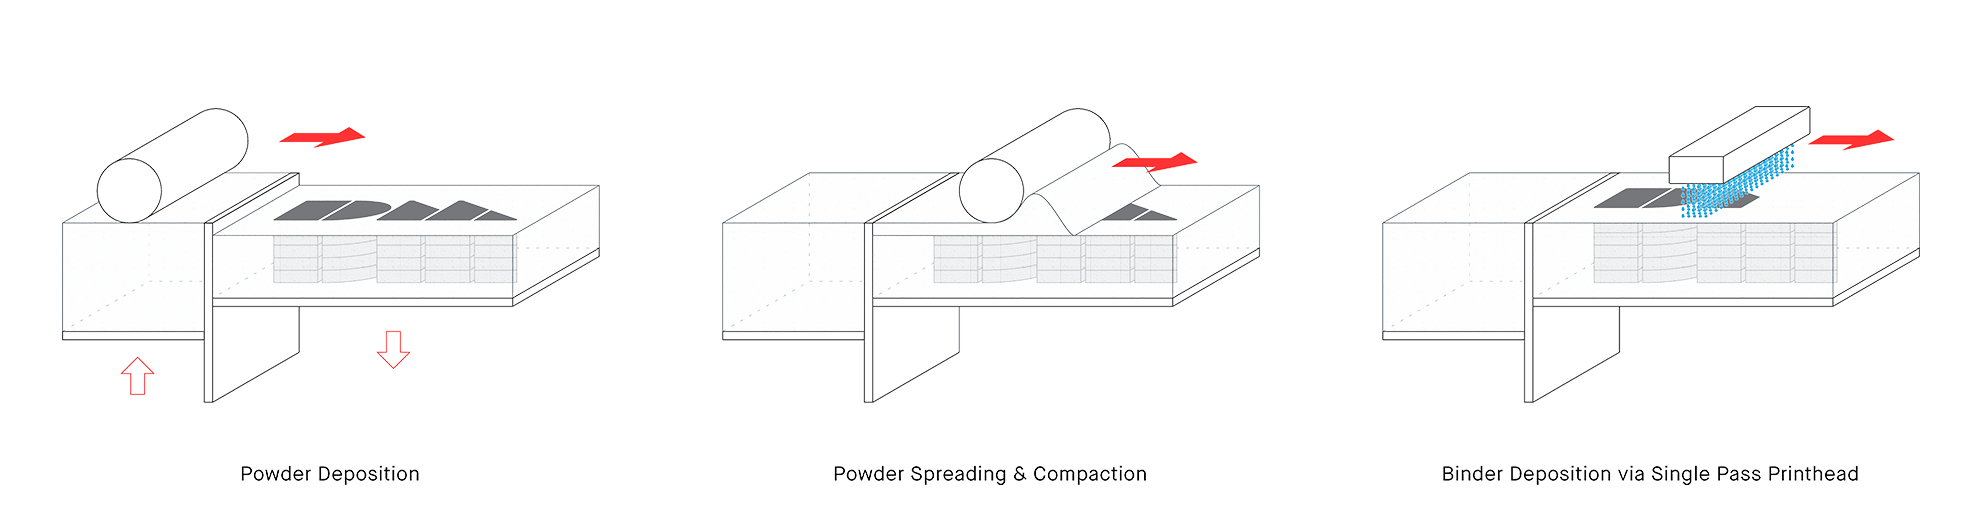 Shop System print process diagram